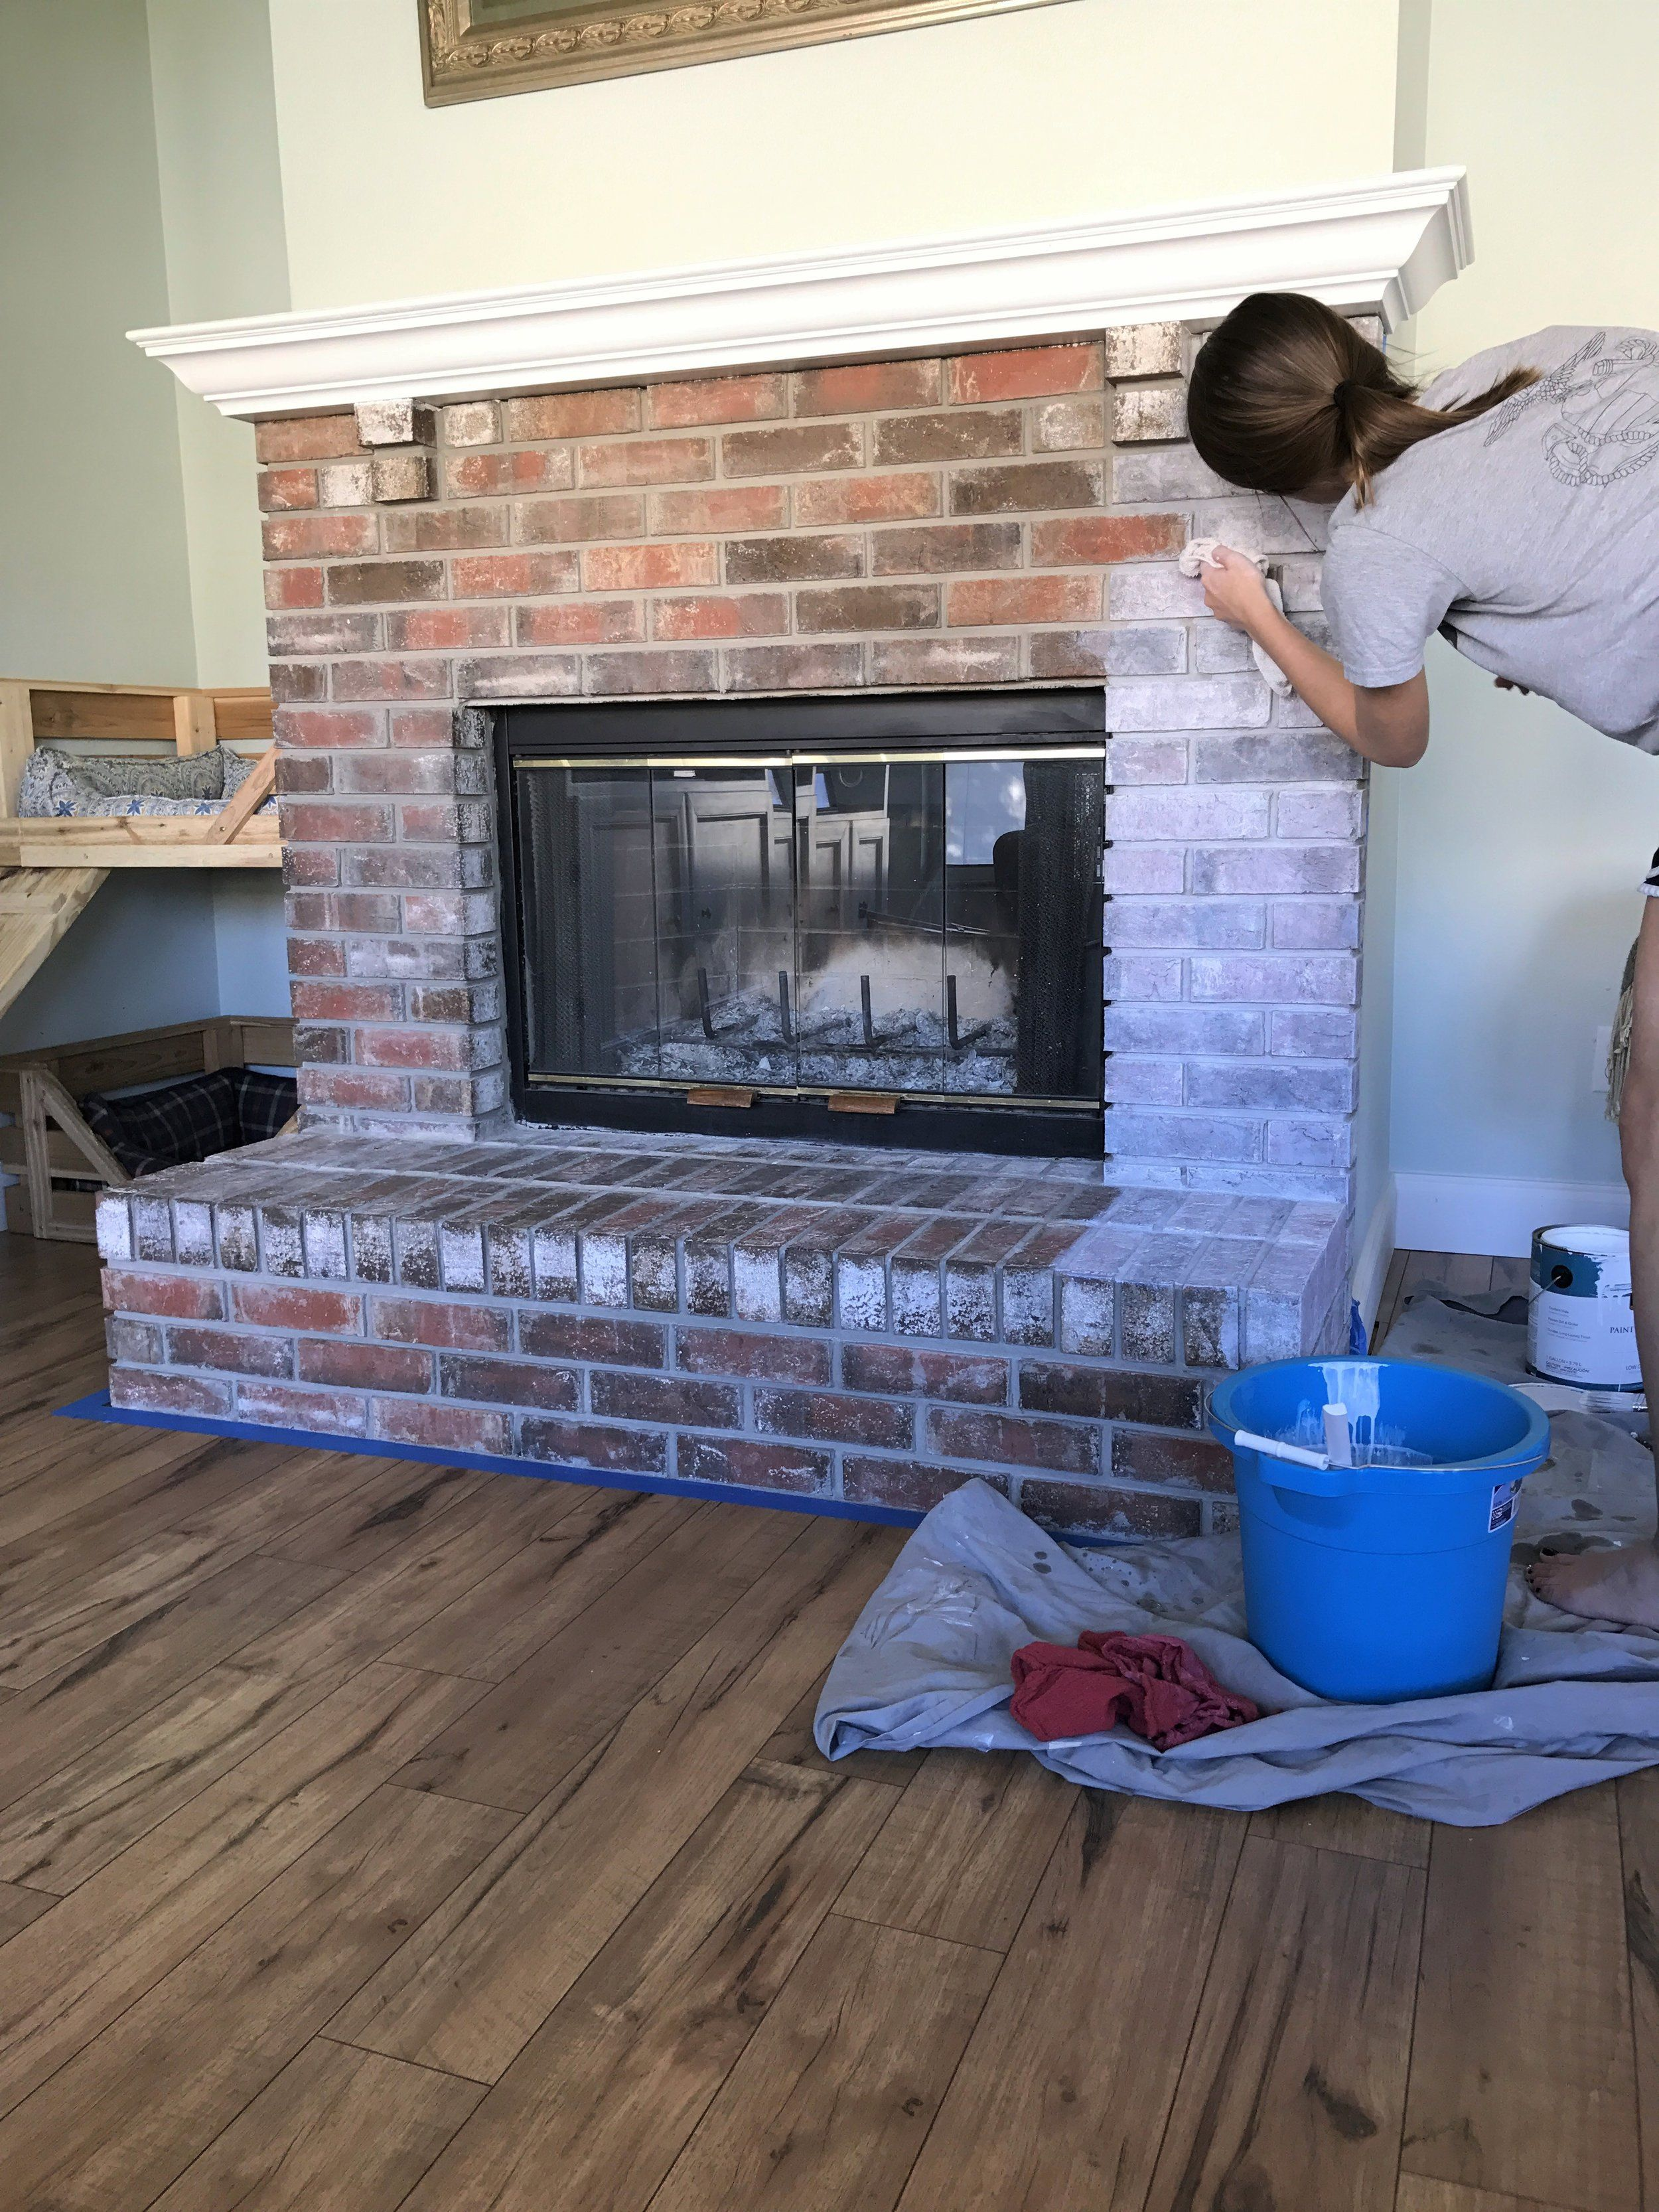 How to Whitewash a Brick Fireplace | Brick fireplace decor ...